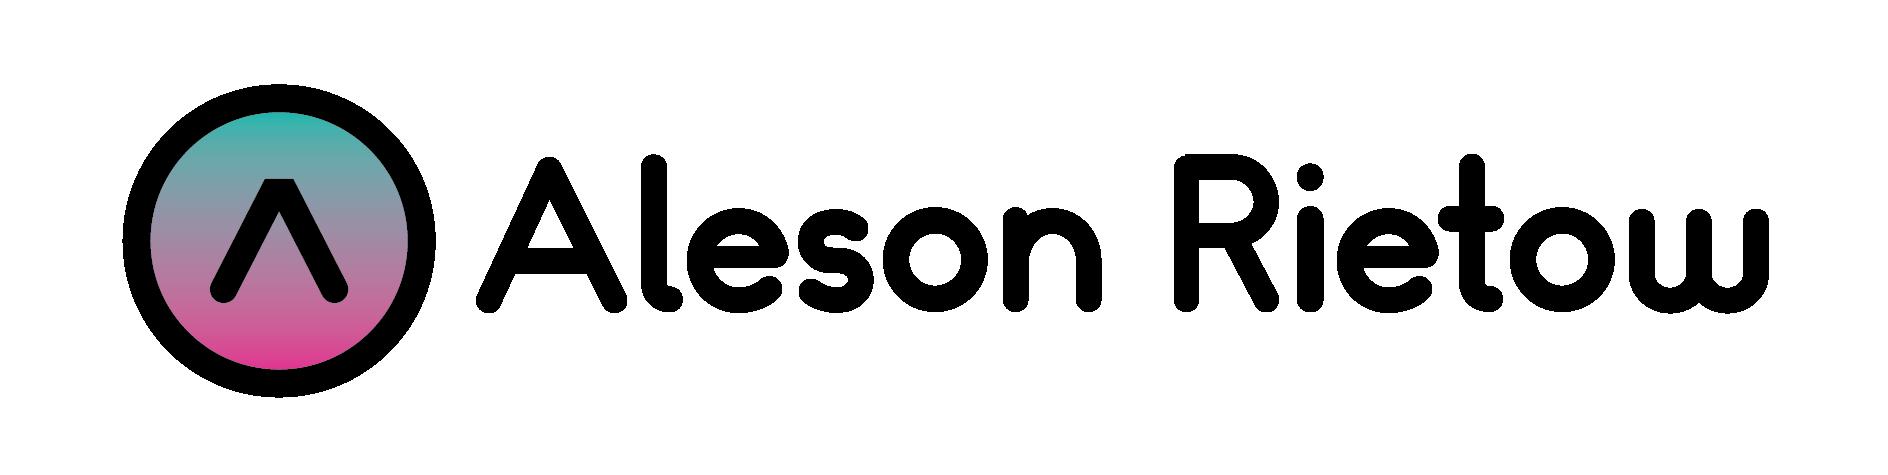 LogoMockup_Aleson's Brand-05.png